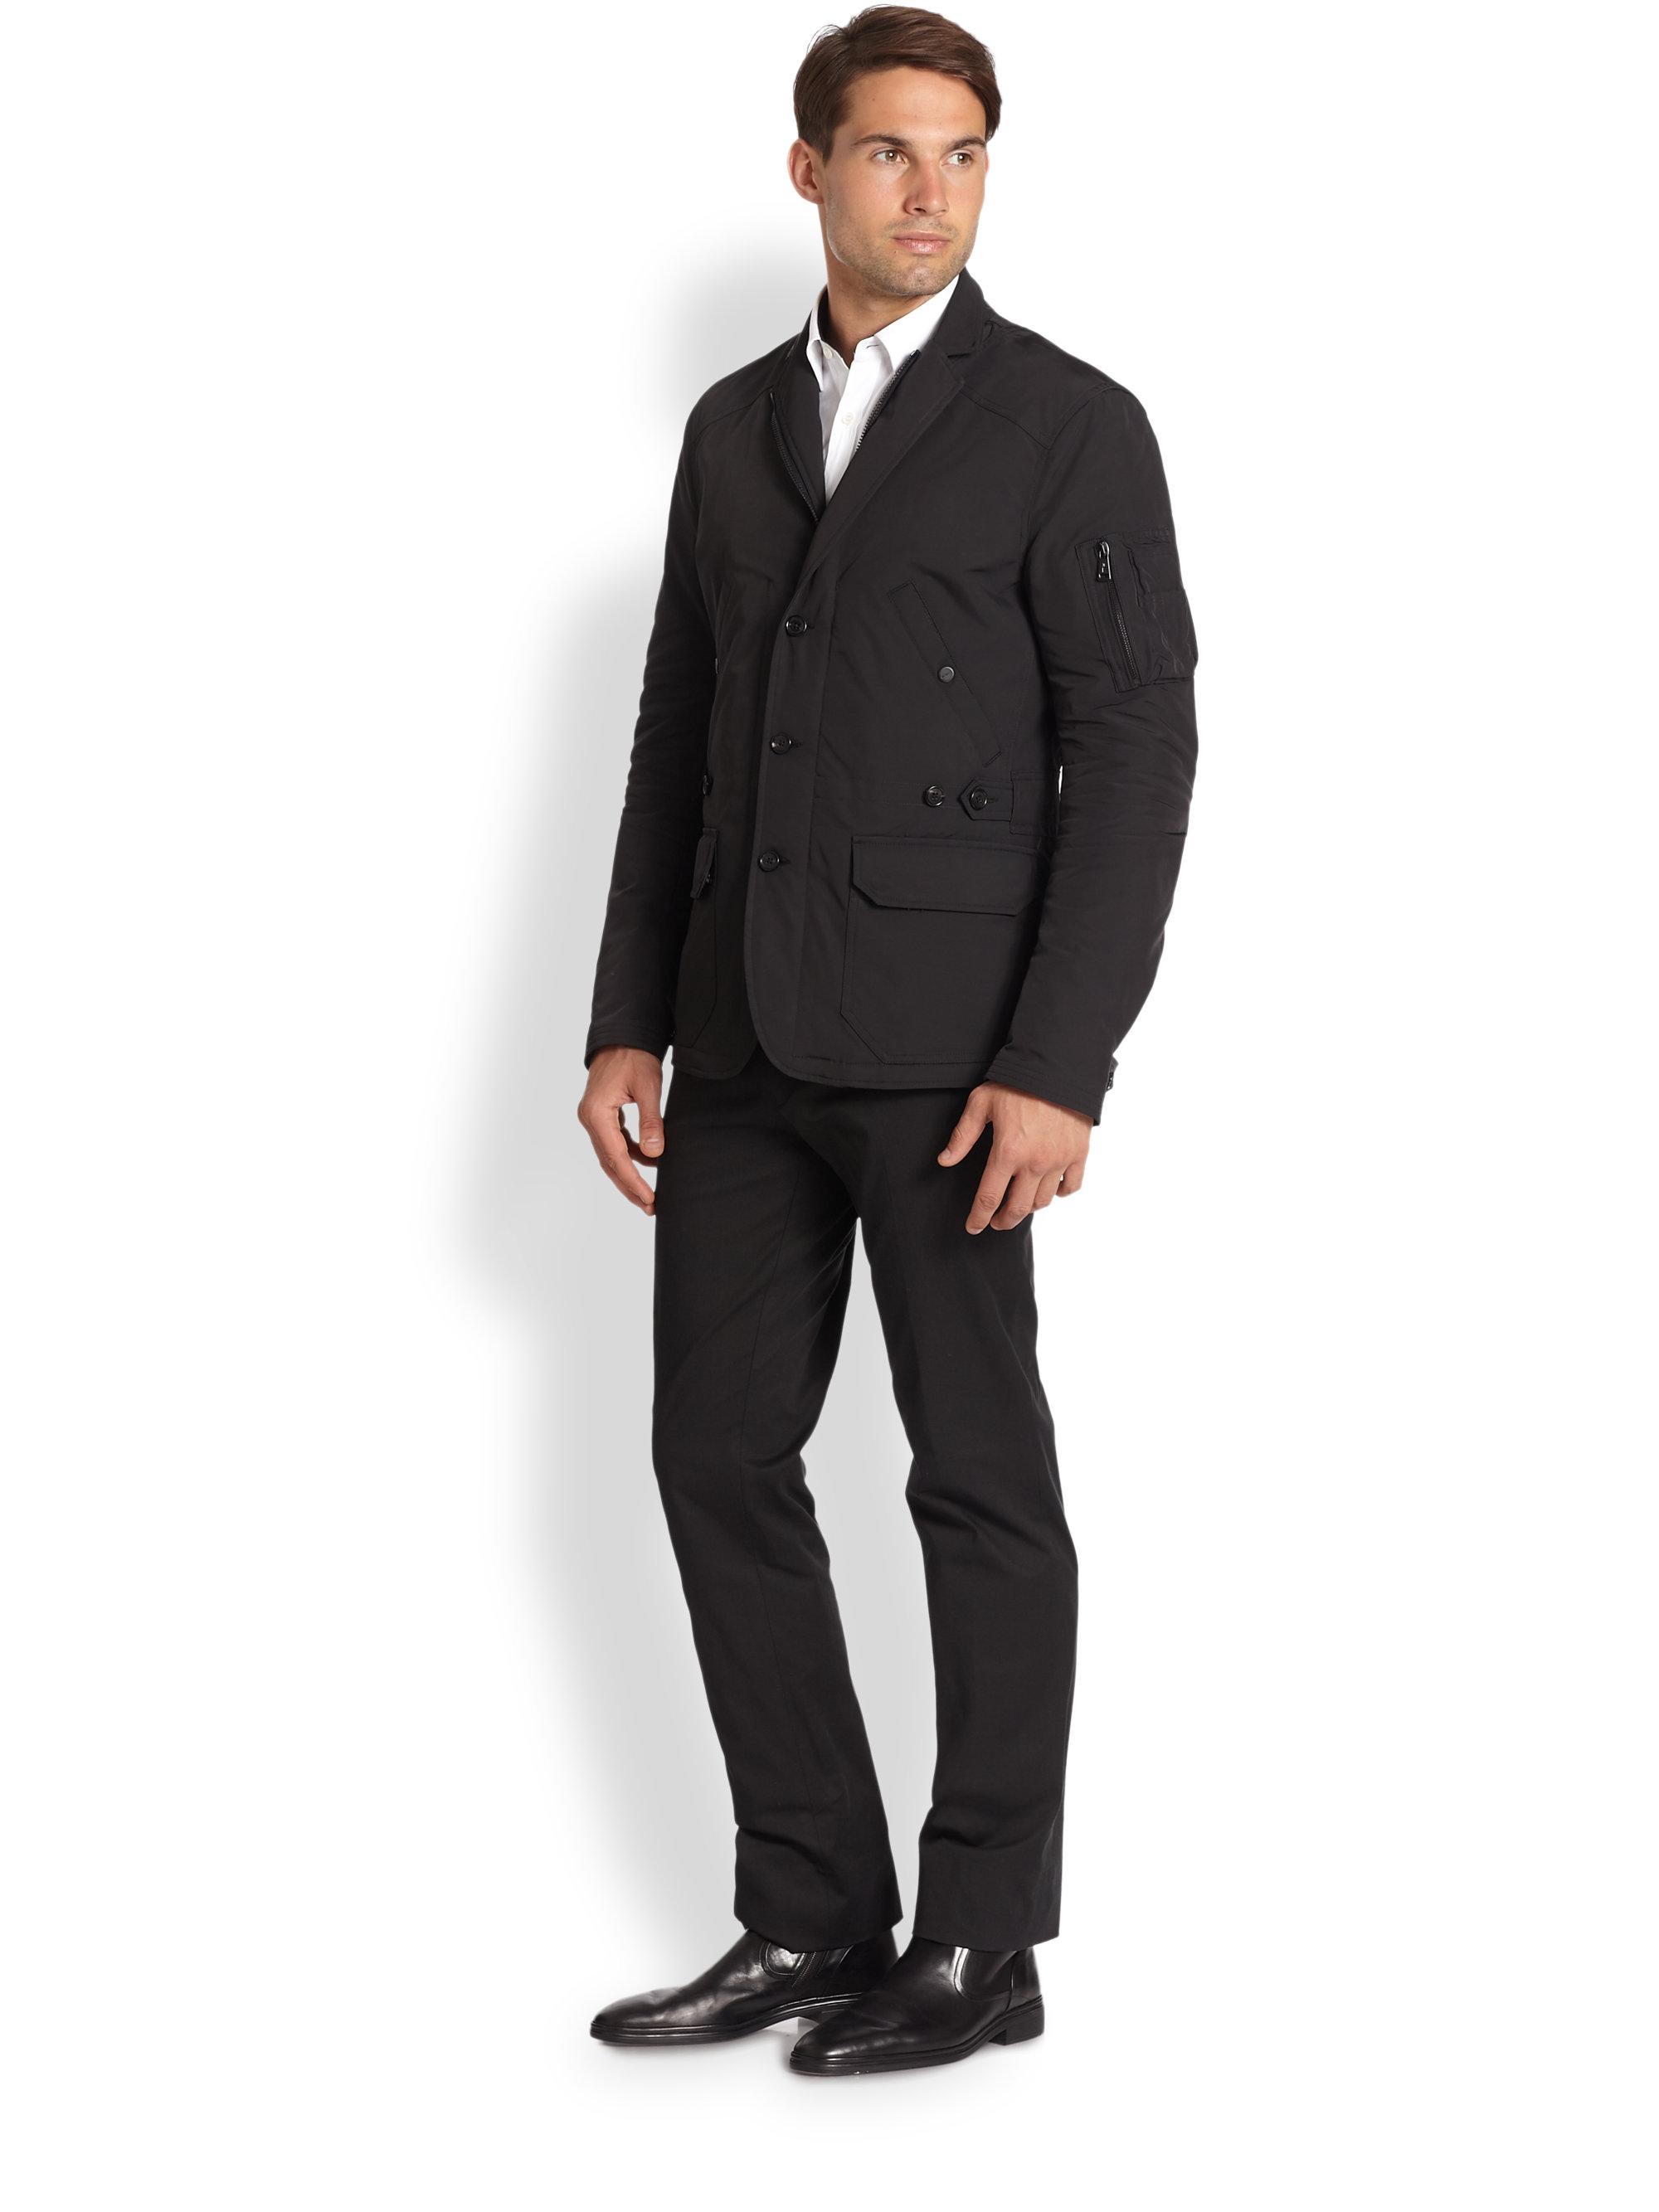 Ralph lauren black label Military Sportcoat in Black for Men | Lyst